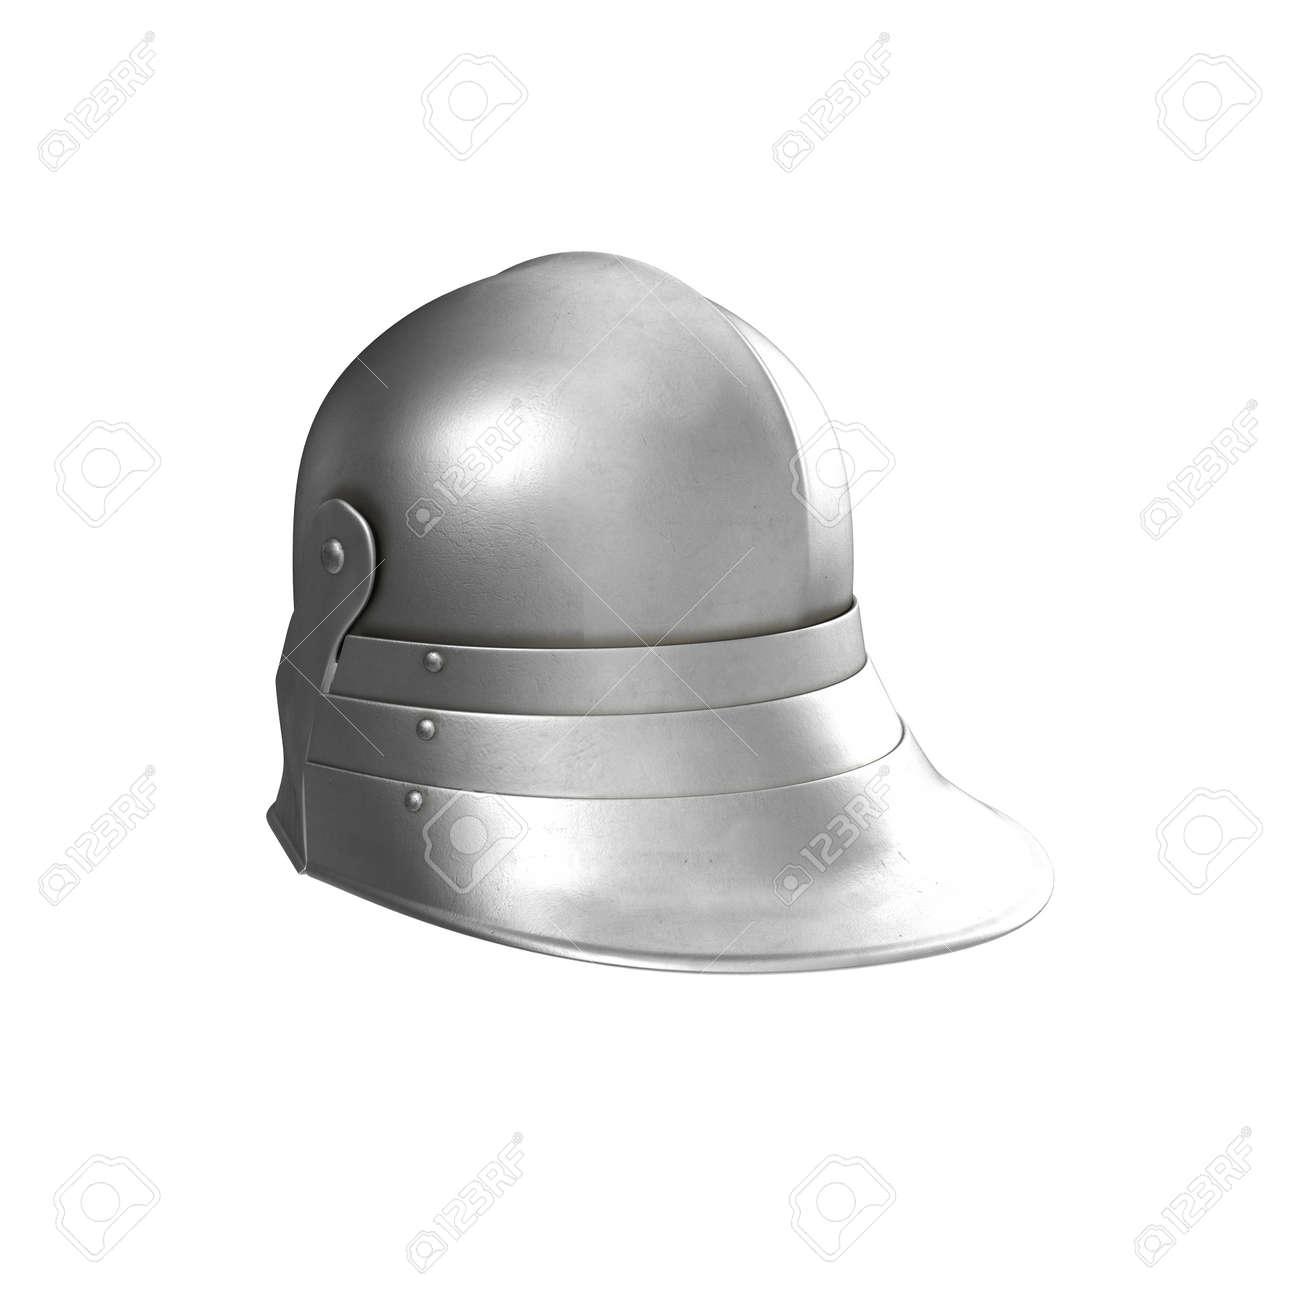 German Sallet Medievaval Helmet  Render On White Background